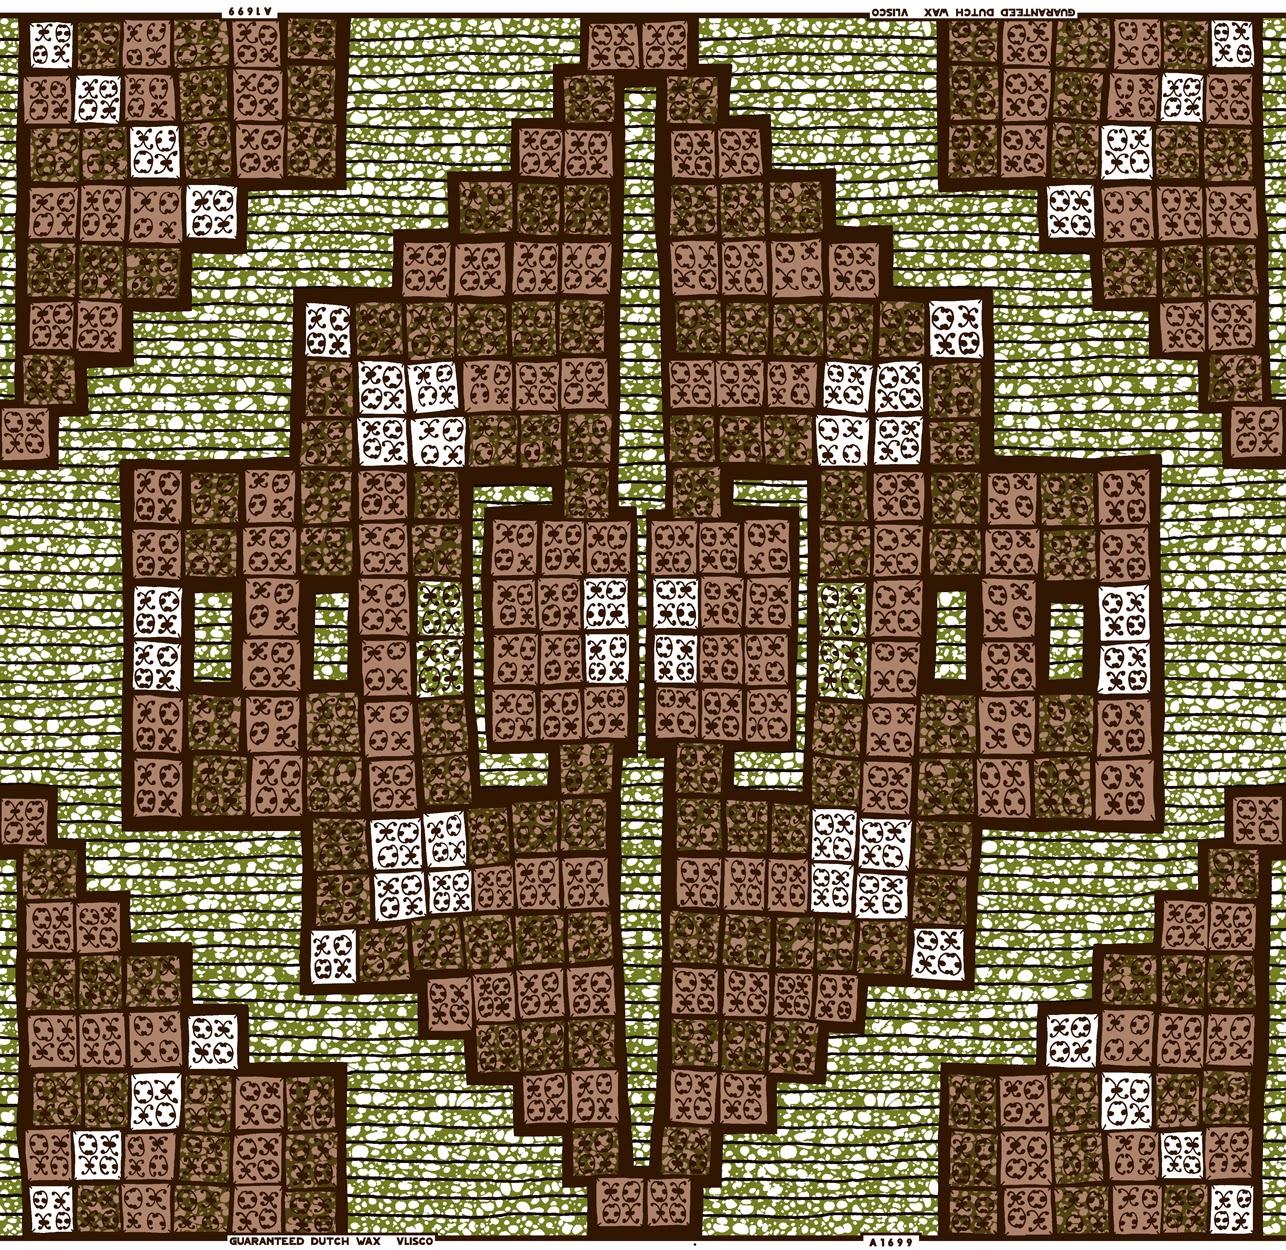 vlisco_pattern_textile_gabriela_sanchez4.jpg